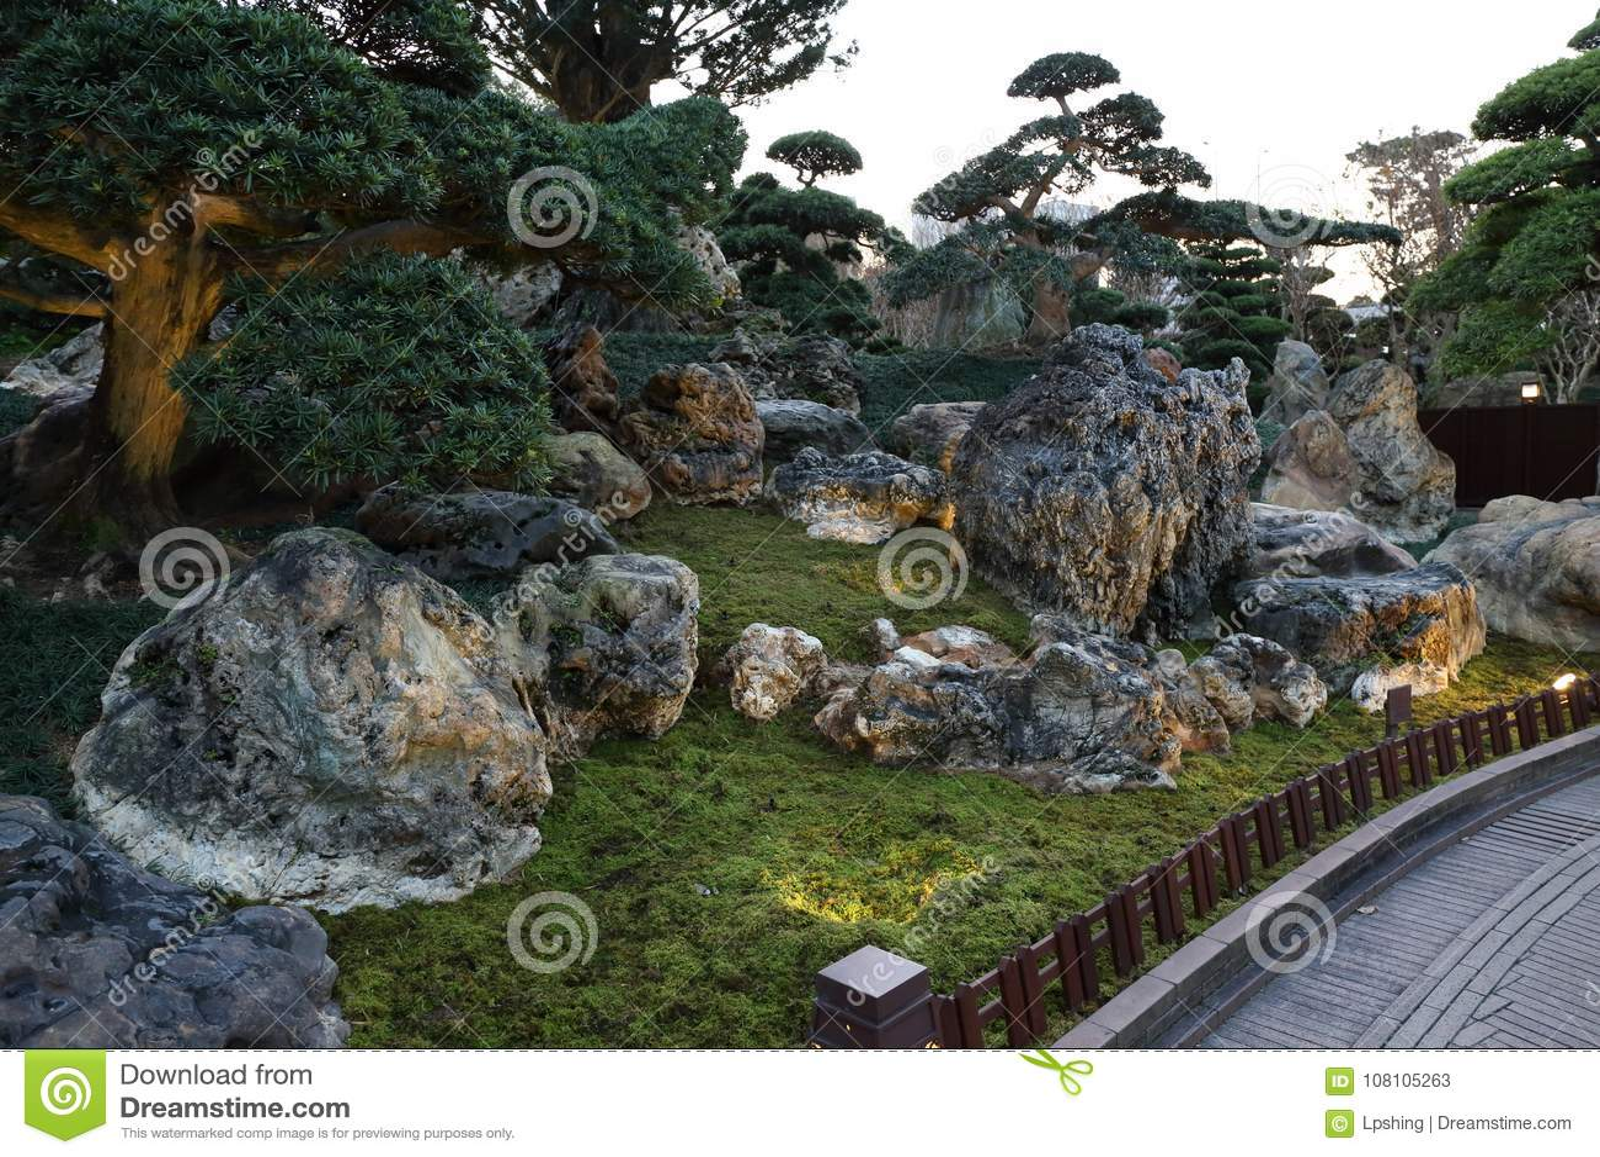 Elegant Chinese Style Garden